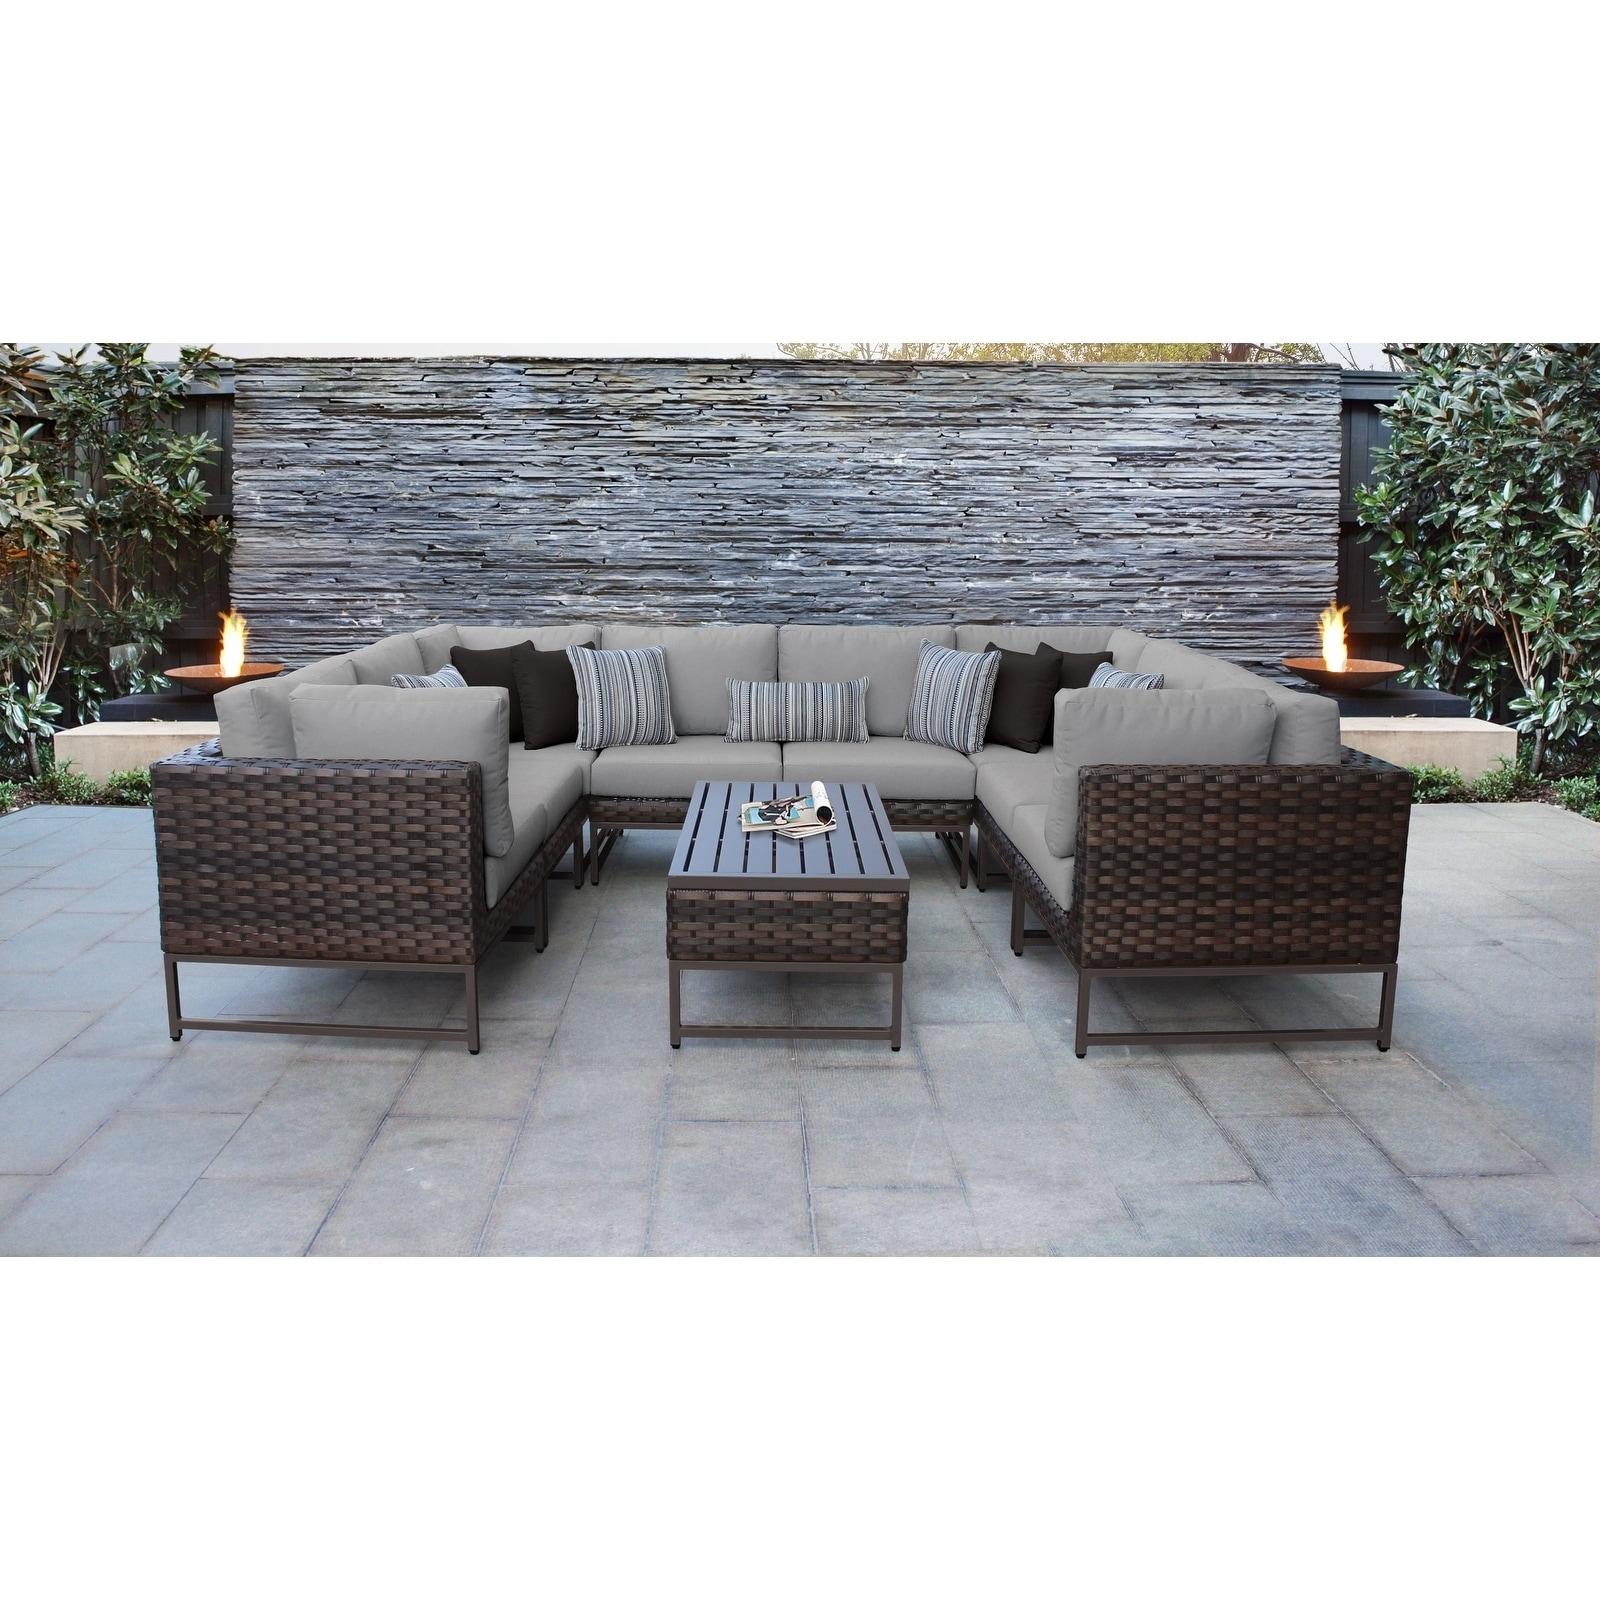 Barcelona 9 Piece Outdoor Wicker Patio Furniture Set 9c